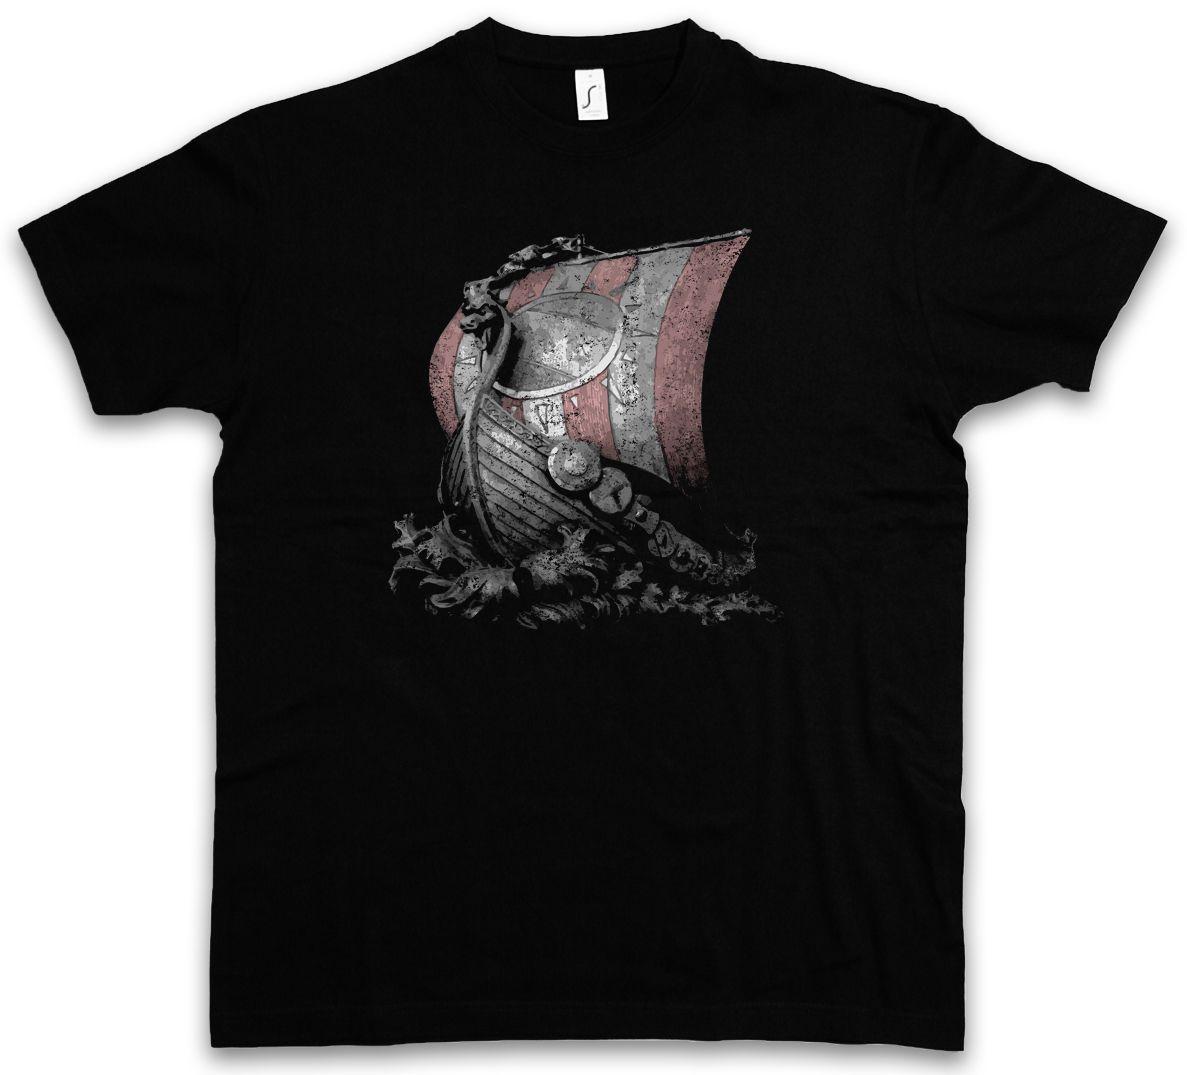 Großhandel Viking Schiff I T Shirt Wikinger Wikinger Longship Nordmänner  Skandinavier Wikinger Boot Coole Zufällige Stolz T Shirt Männer Von ... 2c00f440d0